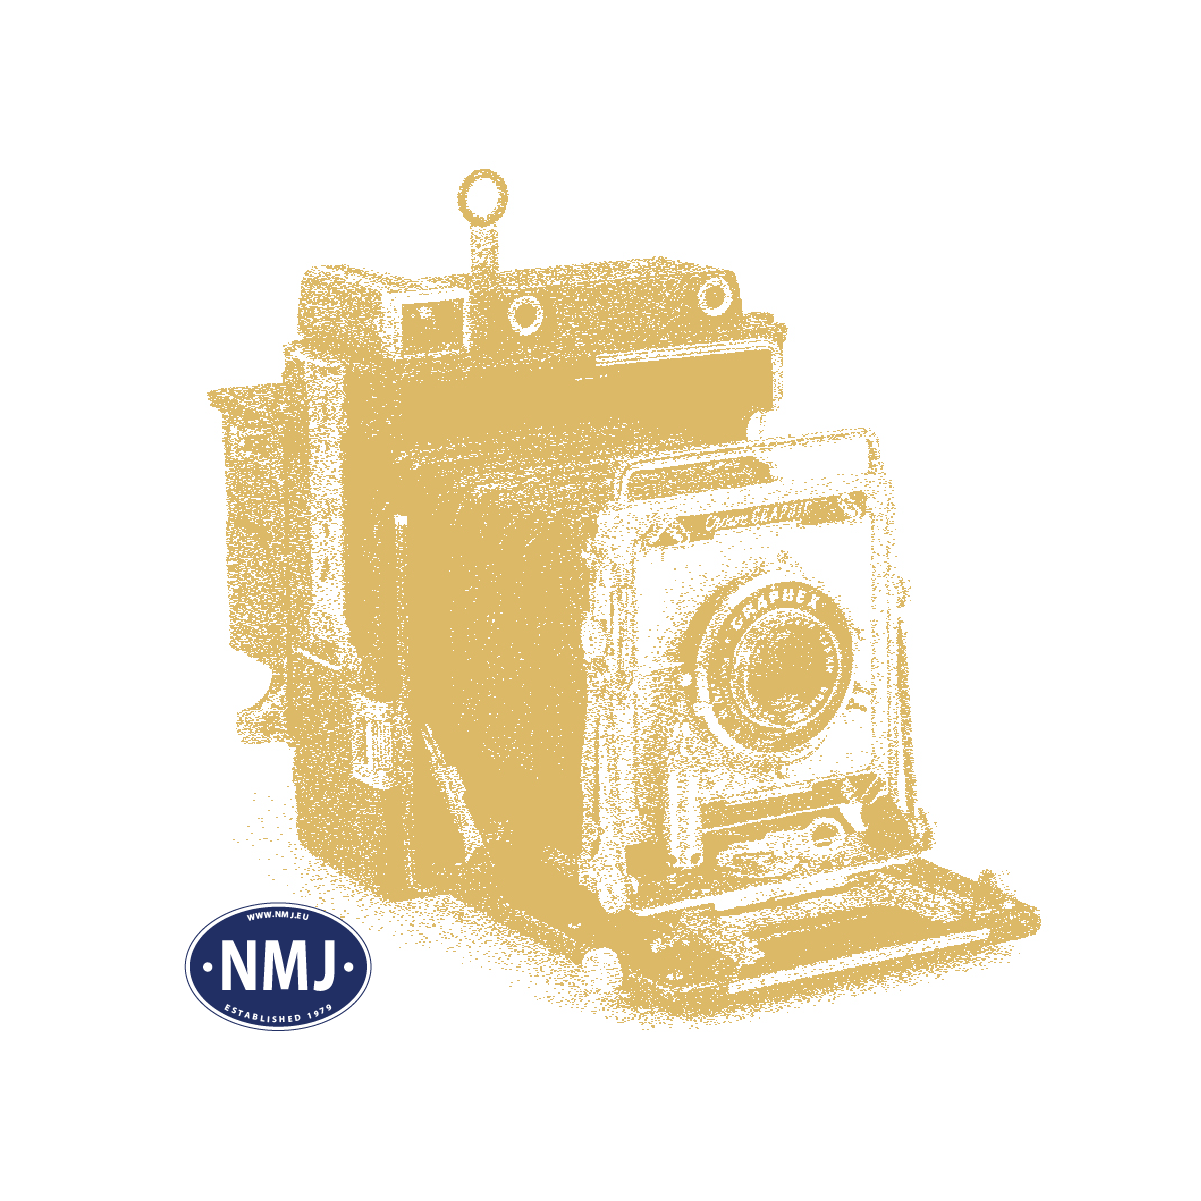 NMJT131.101 - NMJ Topline NSB B3-2 25513 type 3, Gammeldesign (rotbraun)